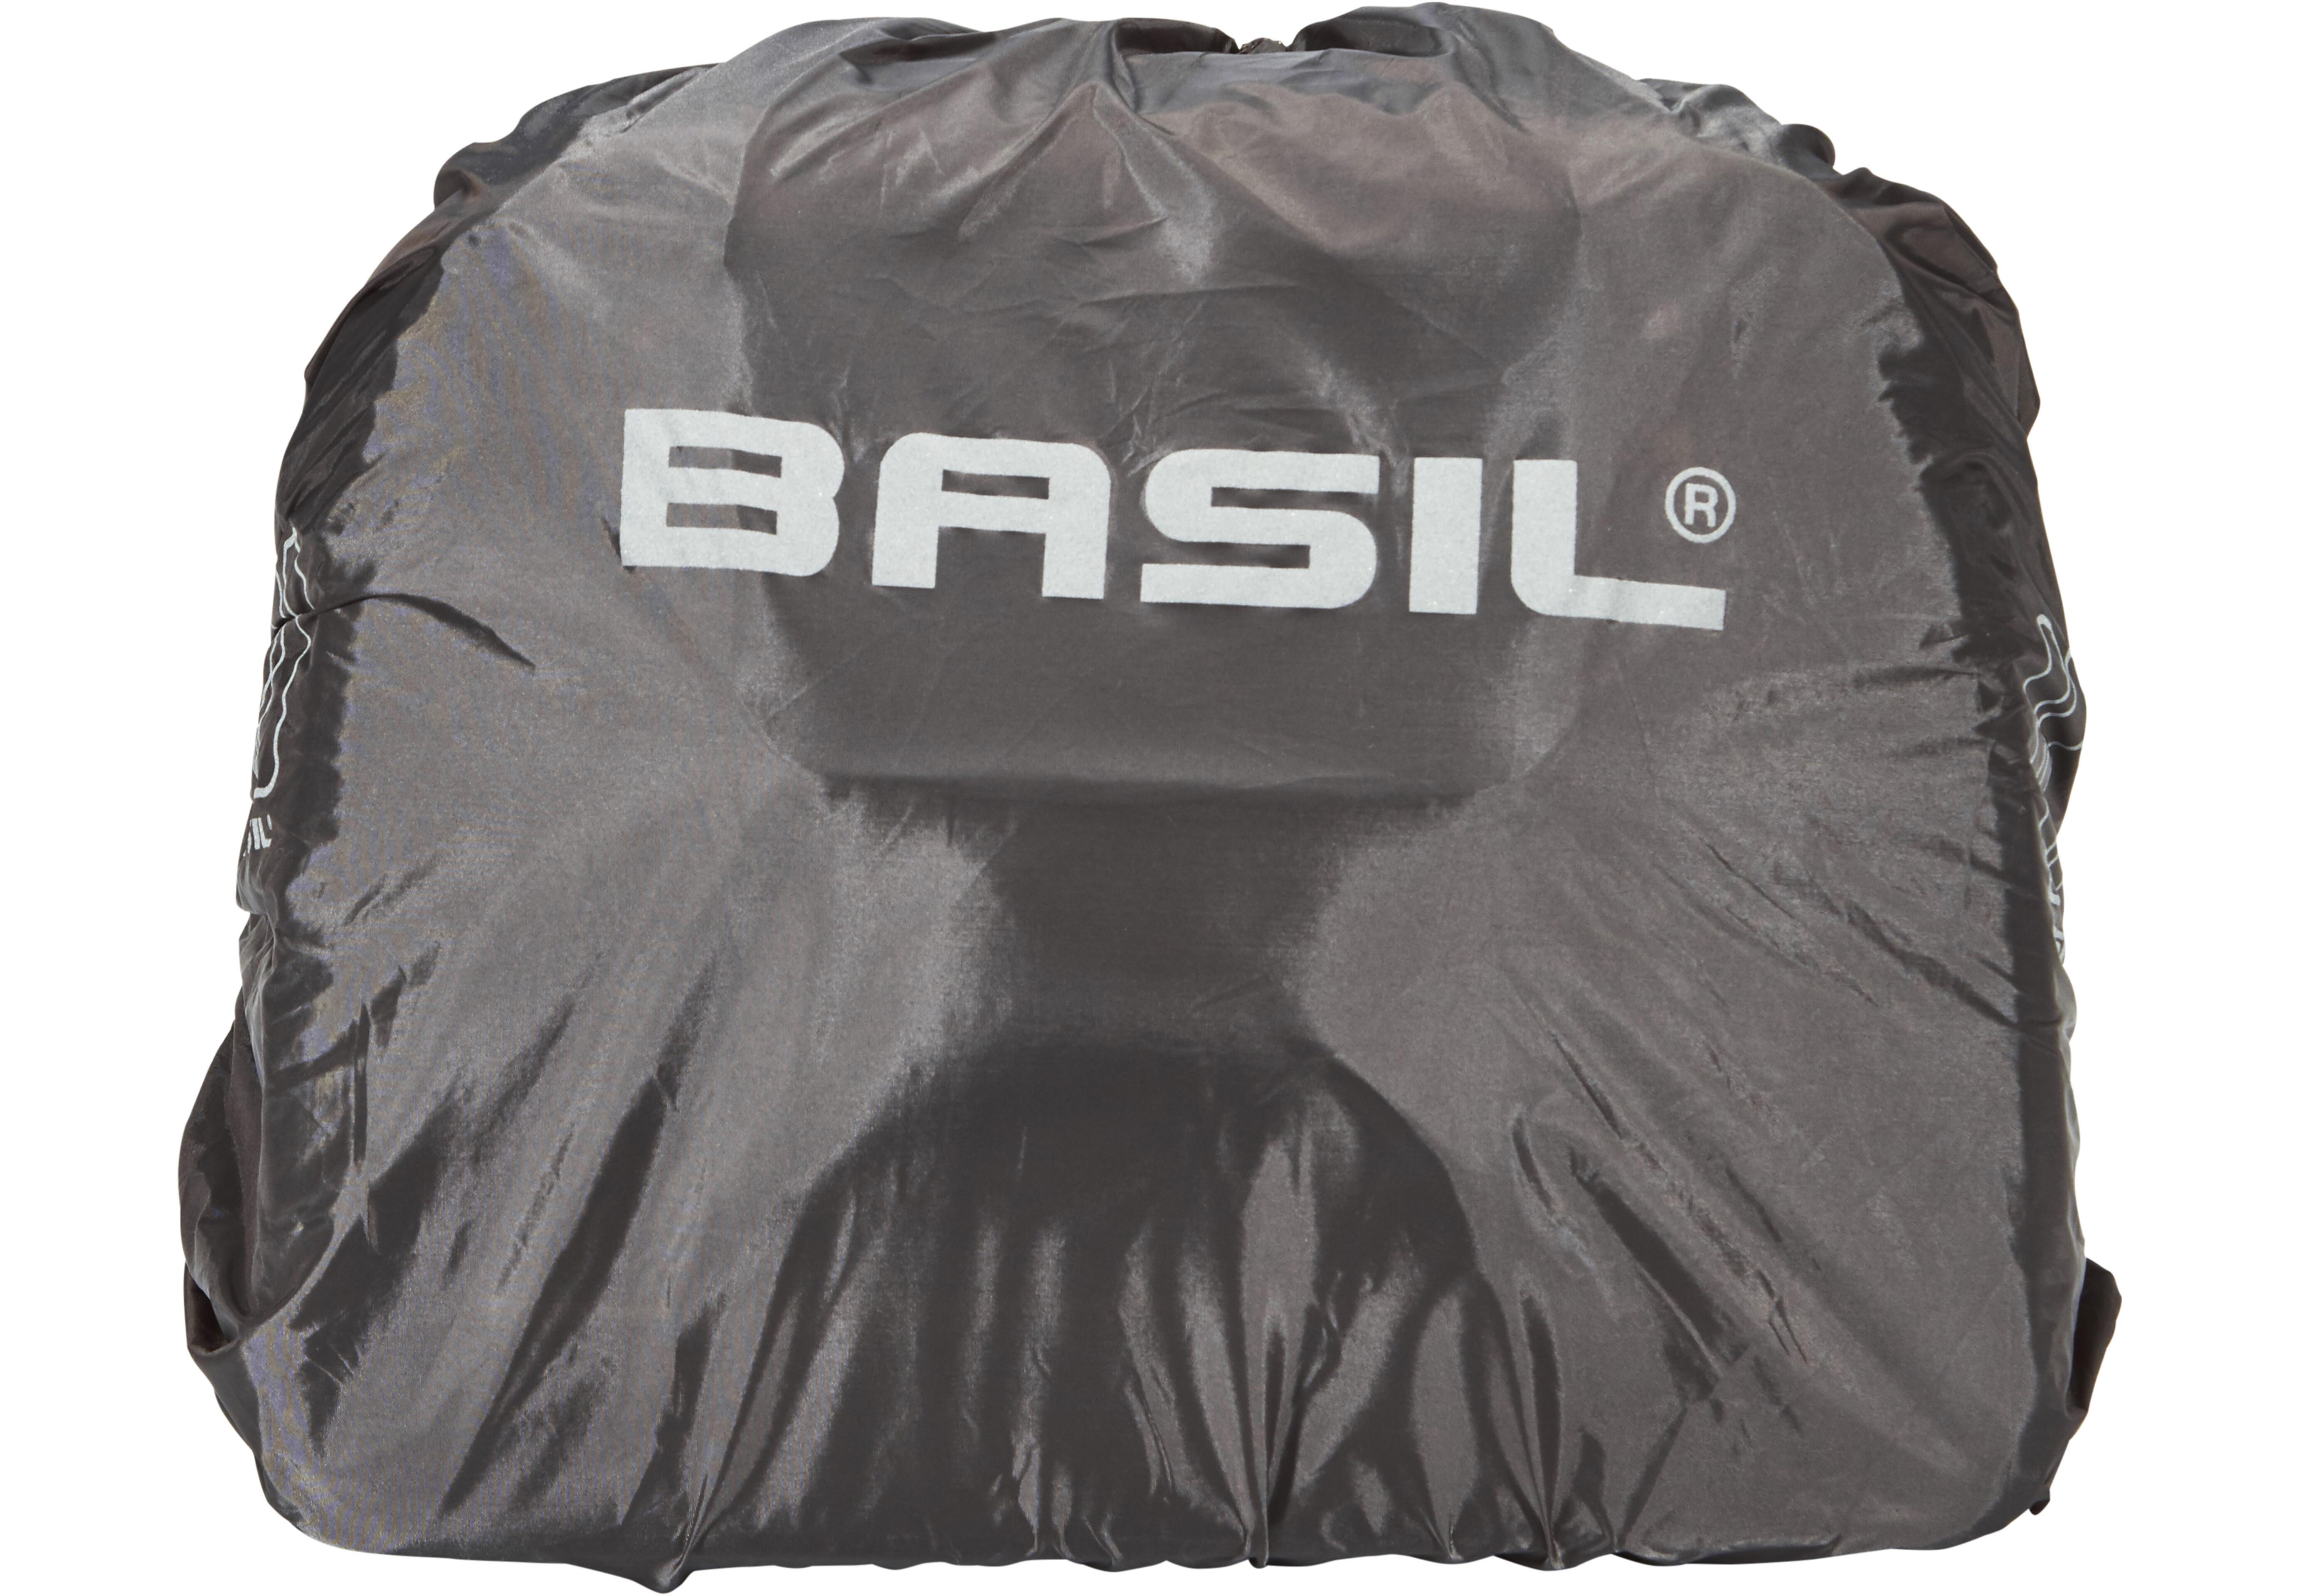 6fa63221792 Basil Portland Business - Bolsa bicicleta Mujer - 19l negro ...